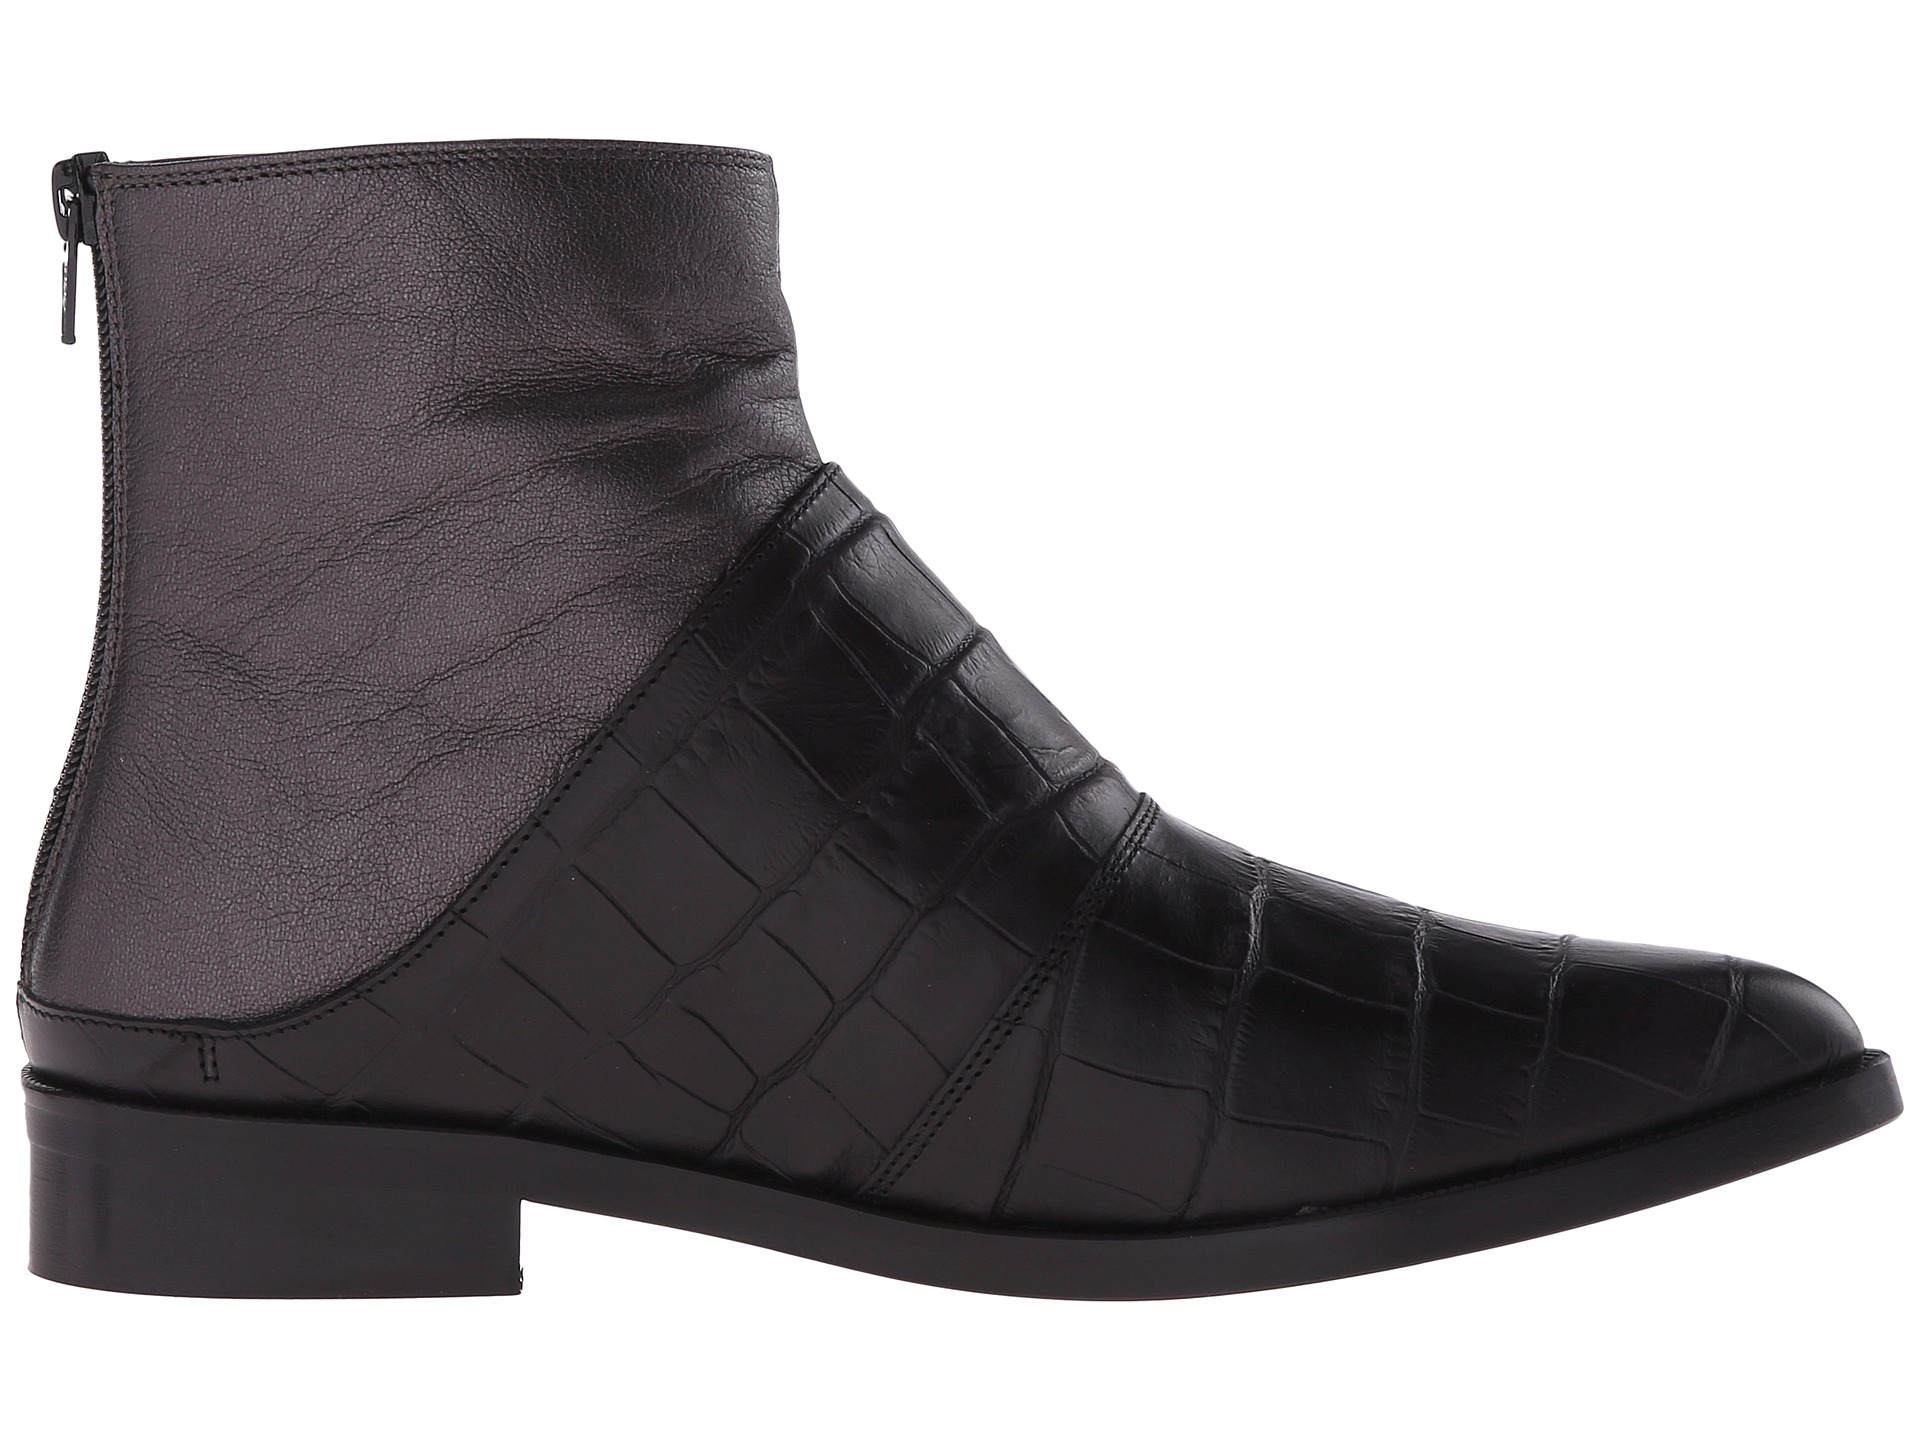 Mens Cheap Chelsea Boots Images Louboutin Sale House Design Discount